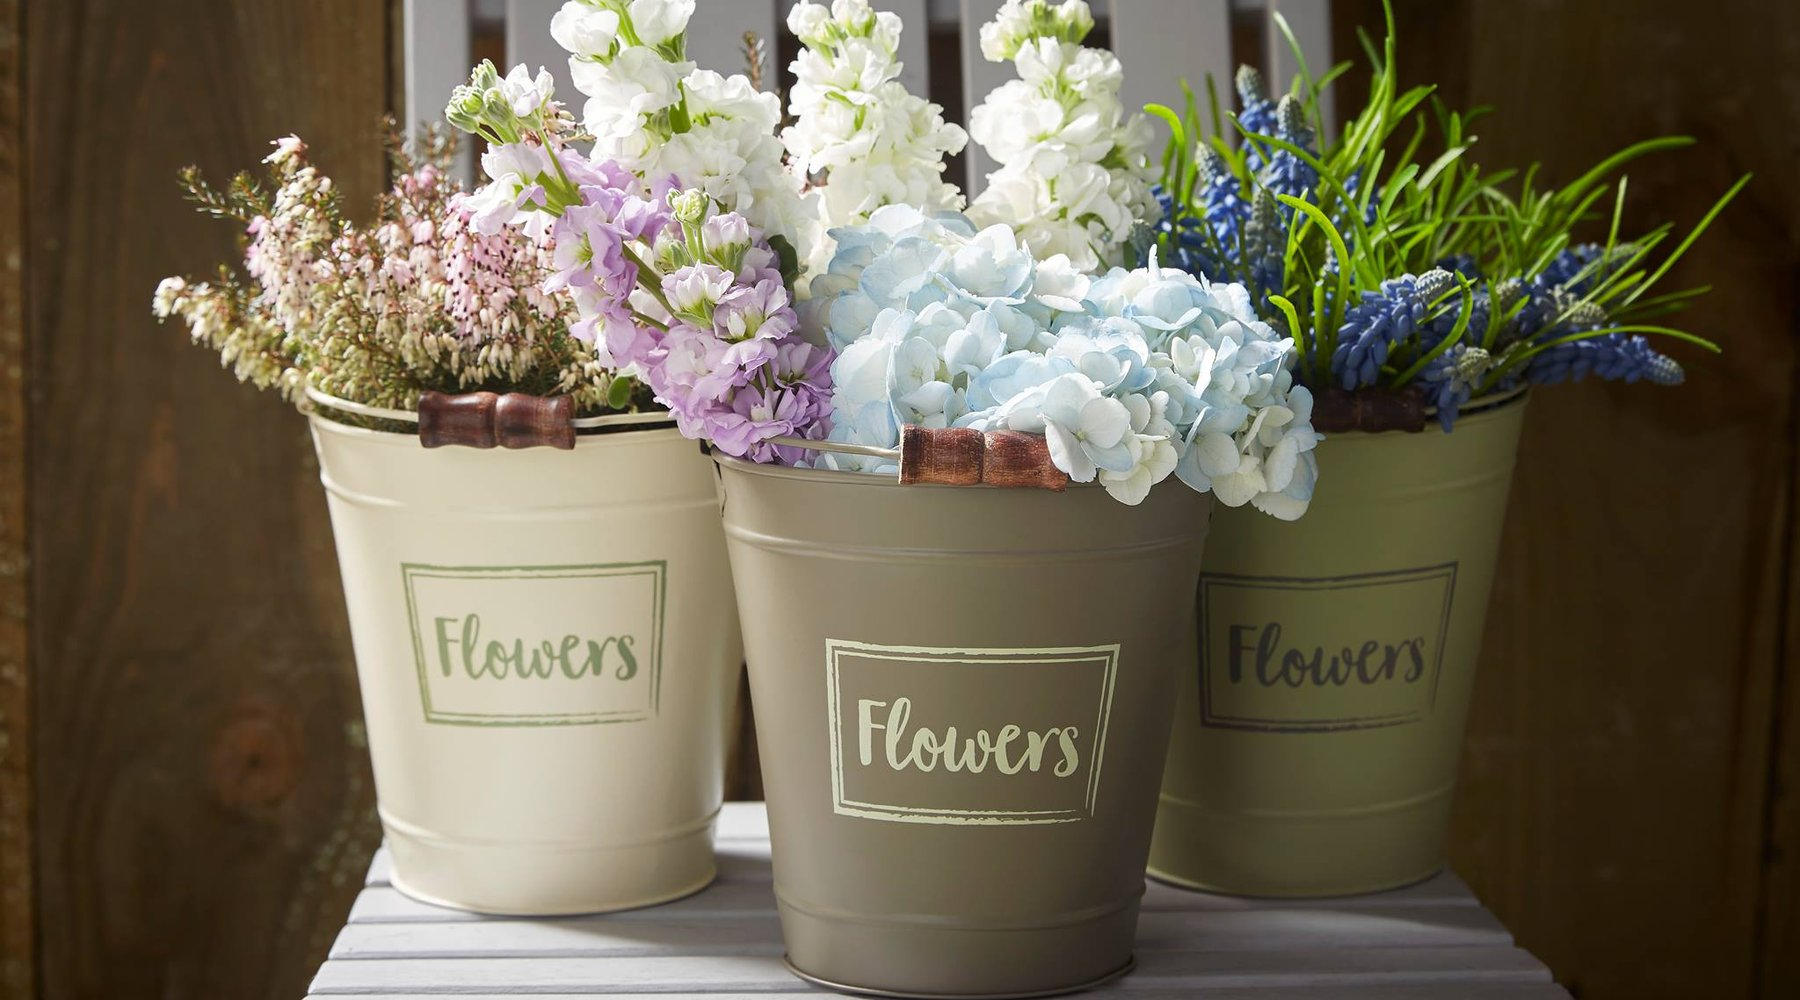 Poundland Flowers